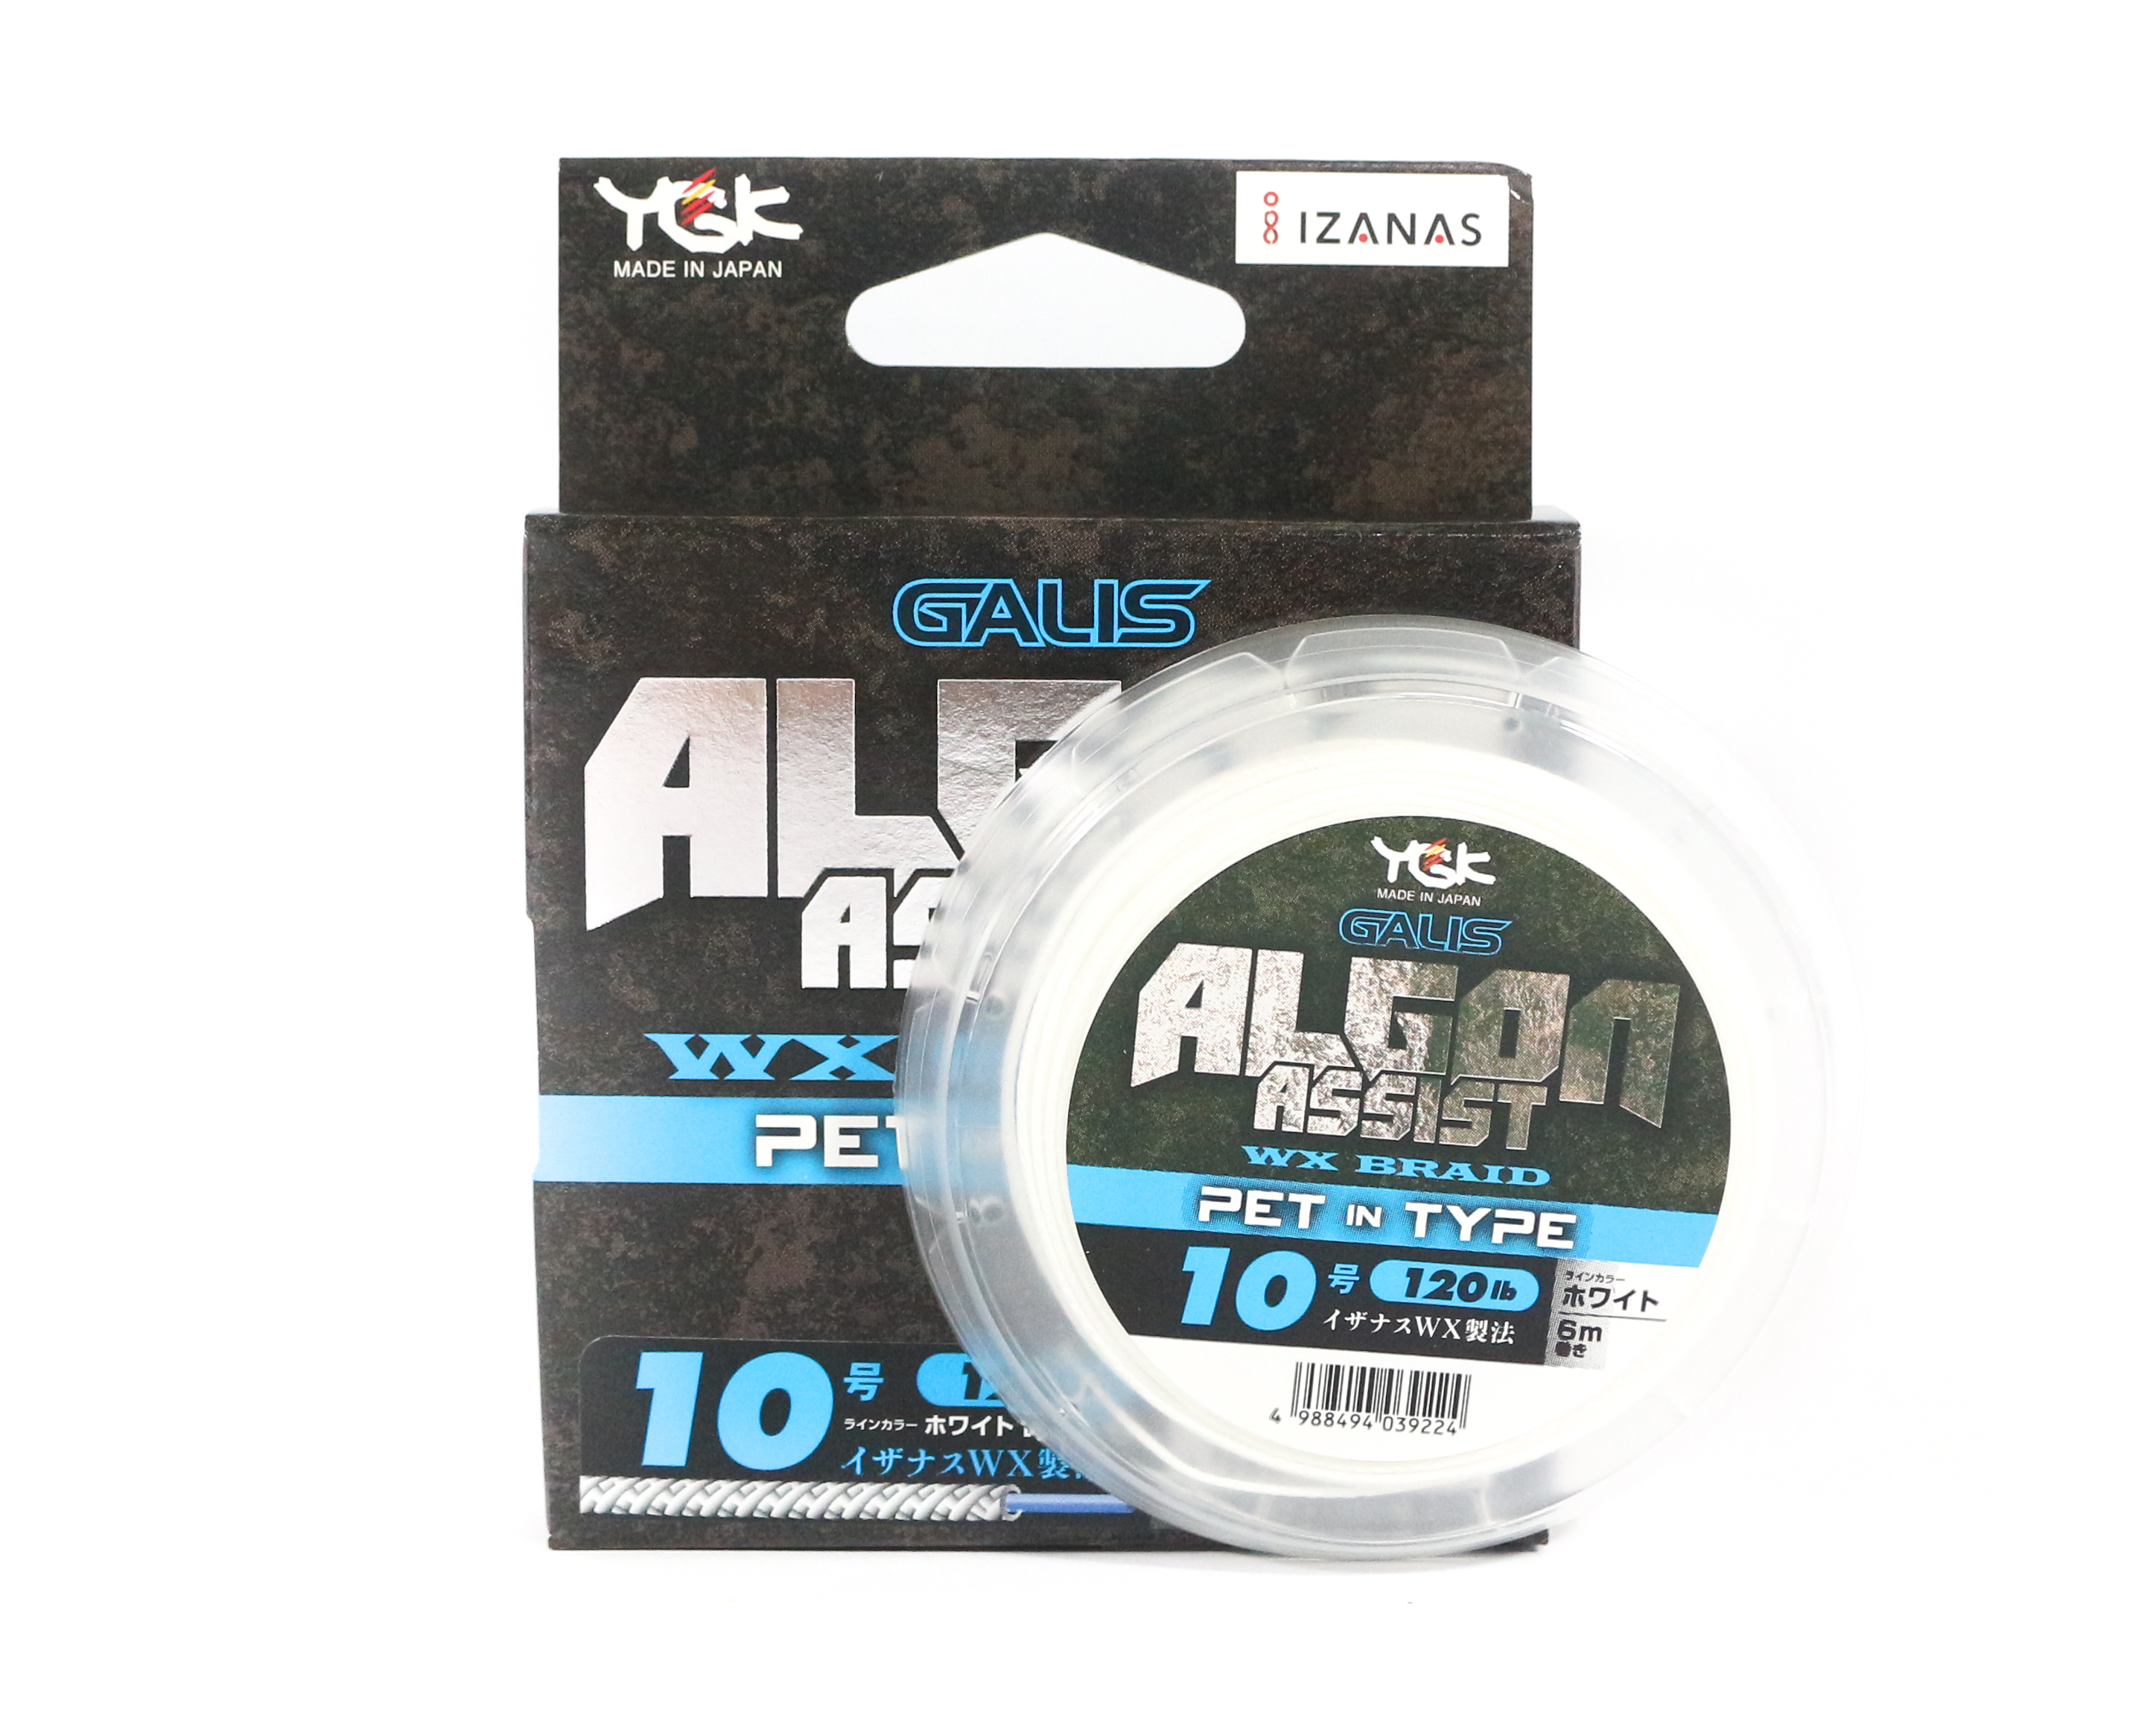 YGK Algon Assist WX Braid PET in Type 6m Size 10, 120lb White (9224)